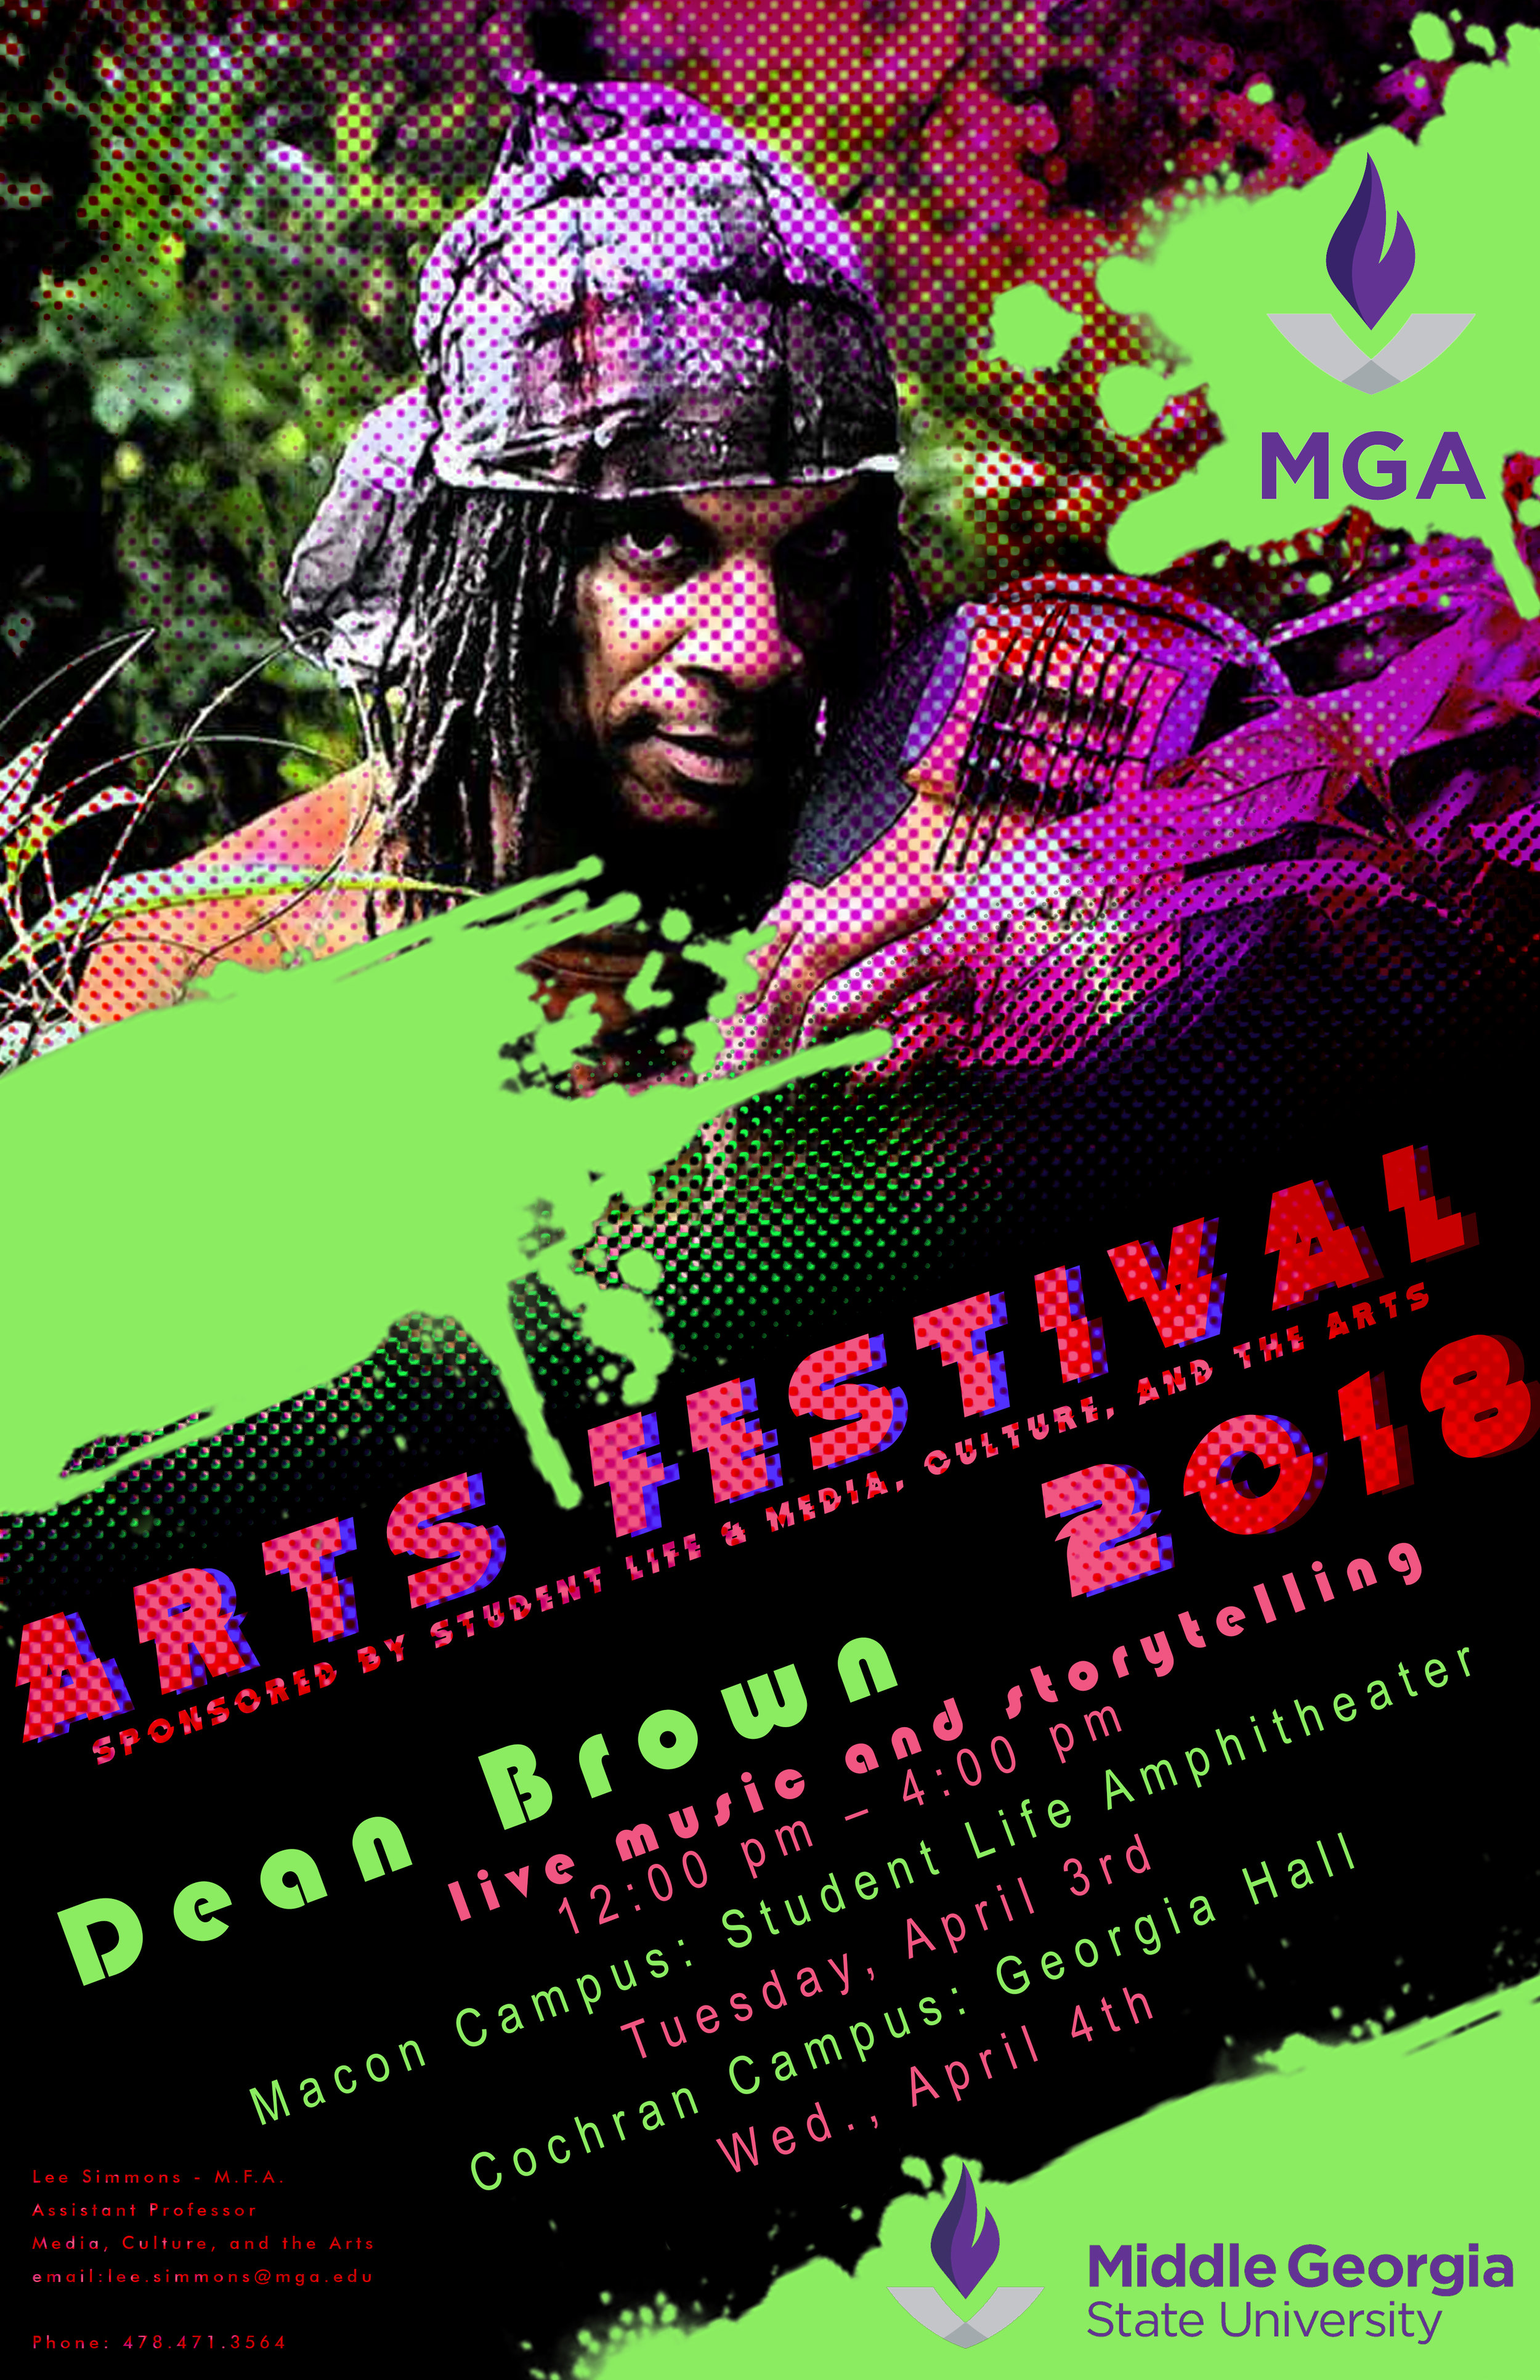 Arts Festival 2018 - Dean - 4.3.18 event.jpg